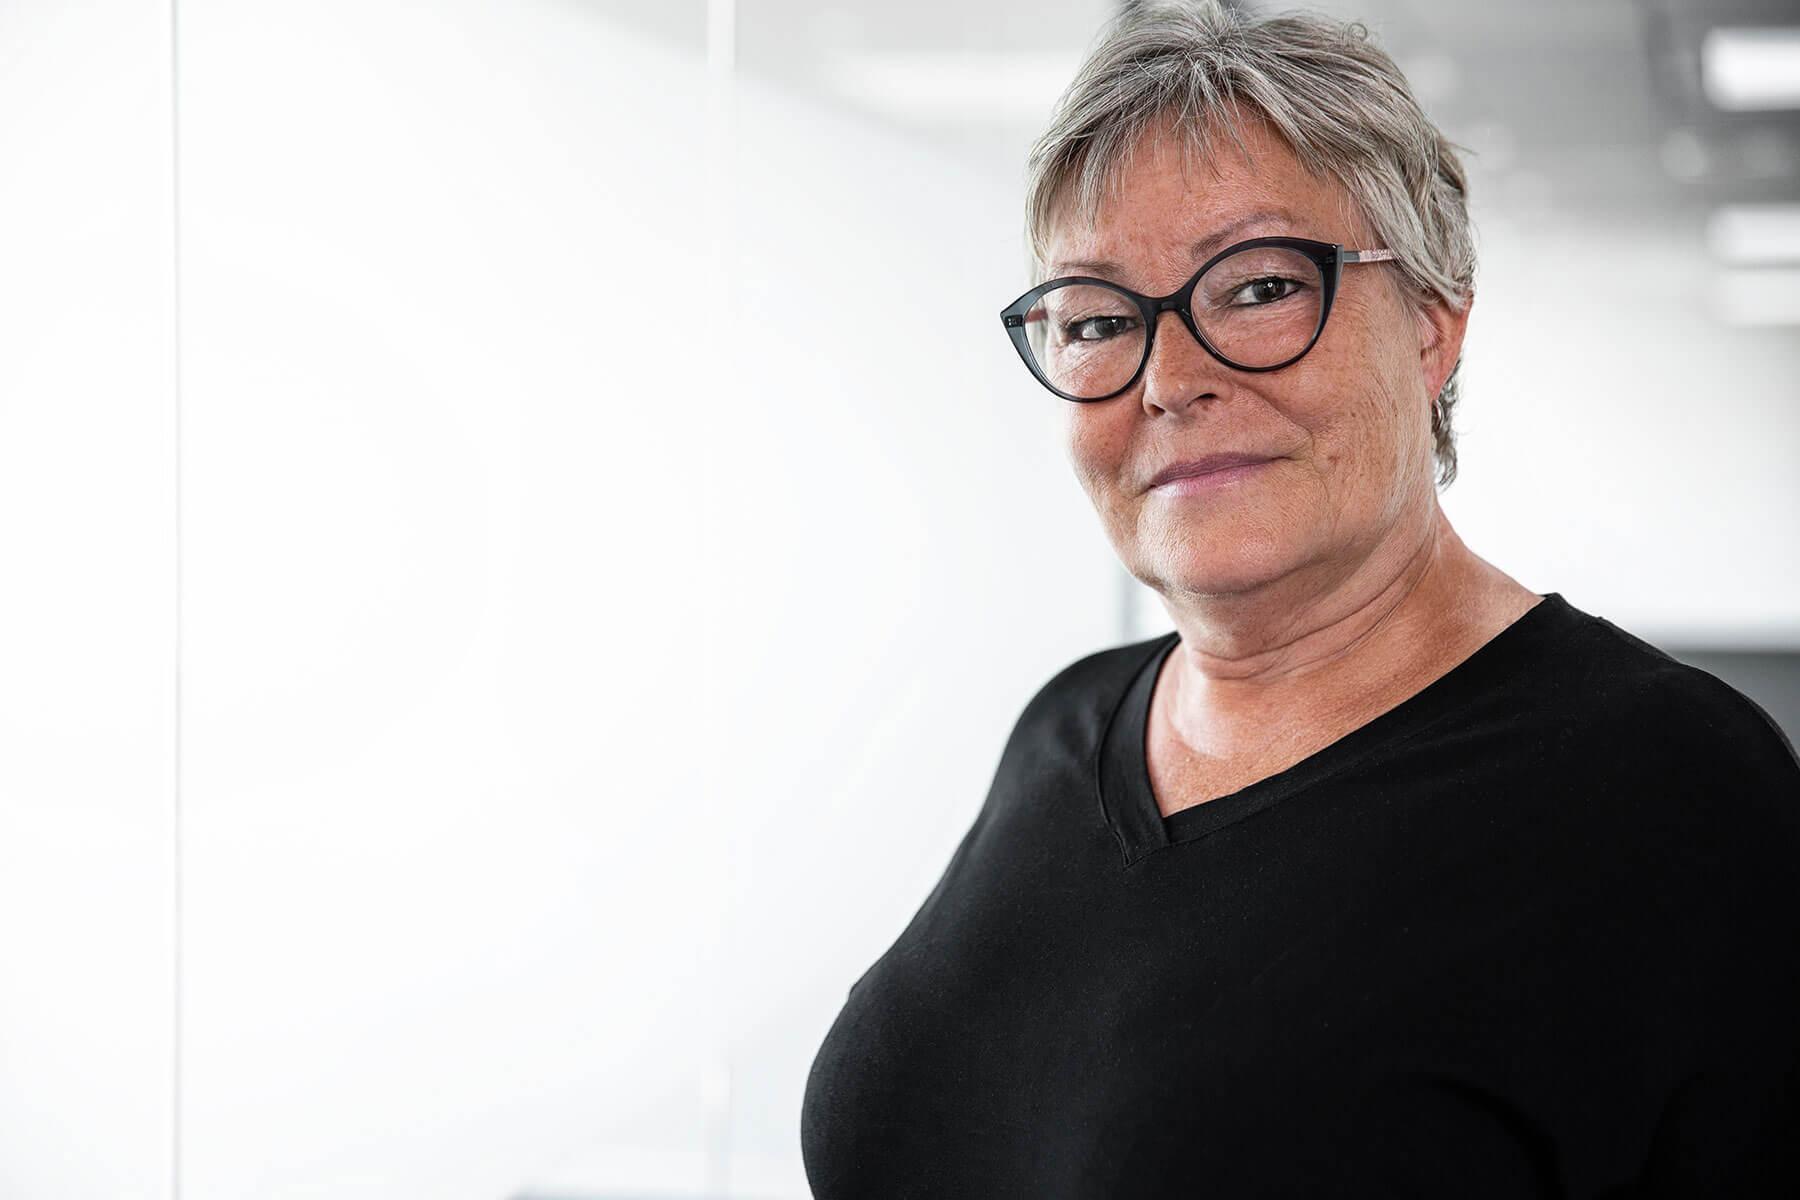 Annette Sannemann